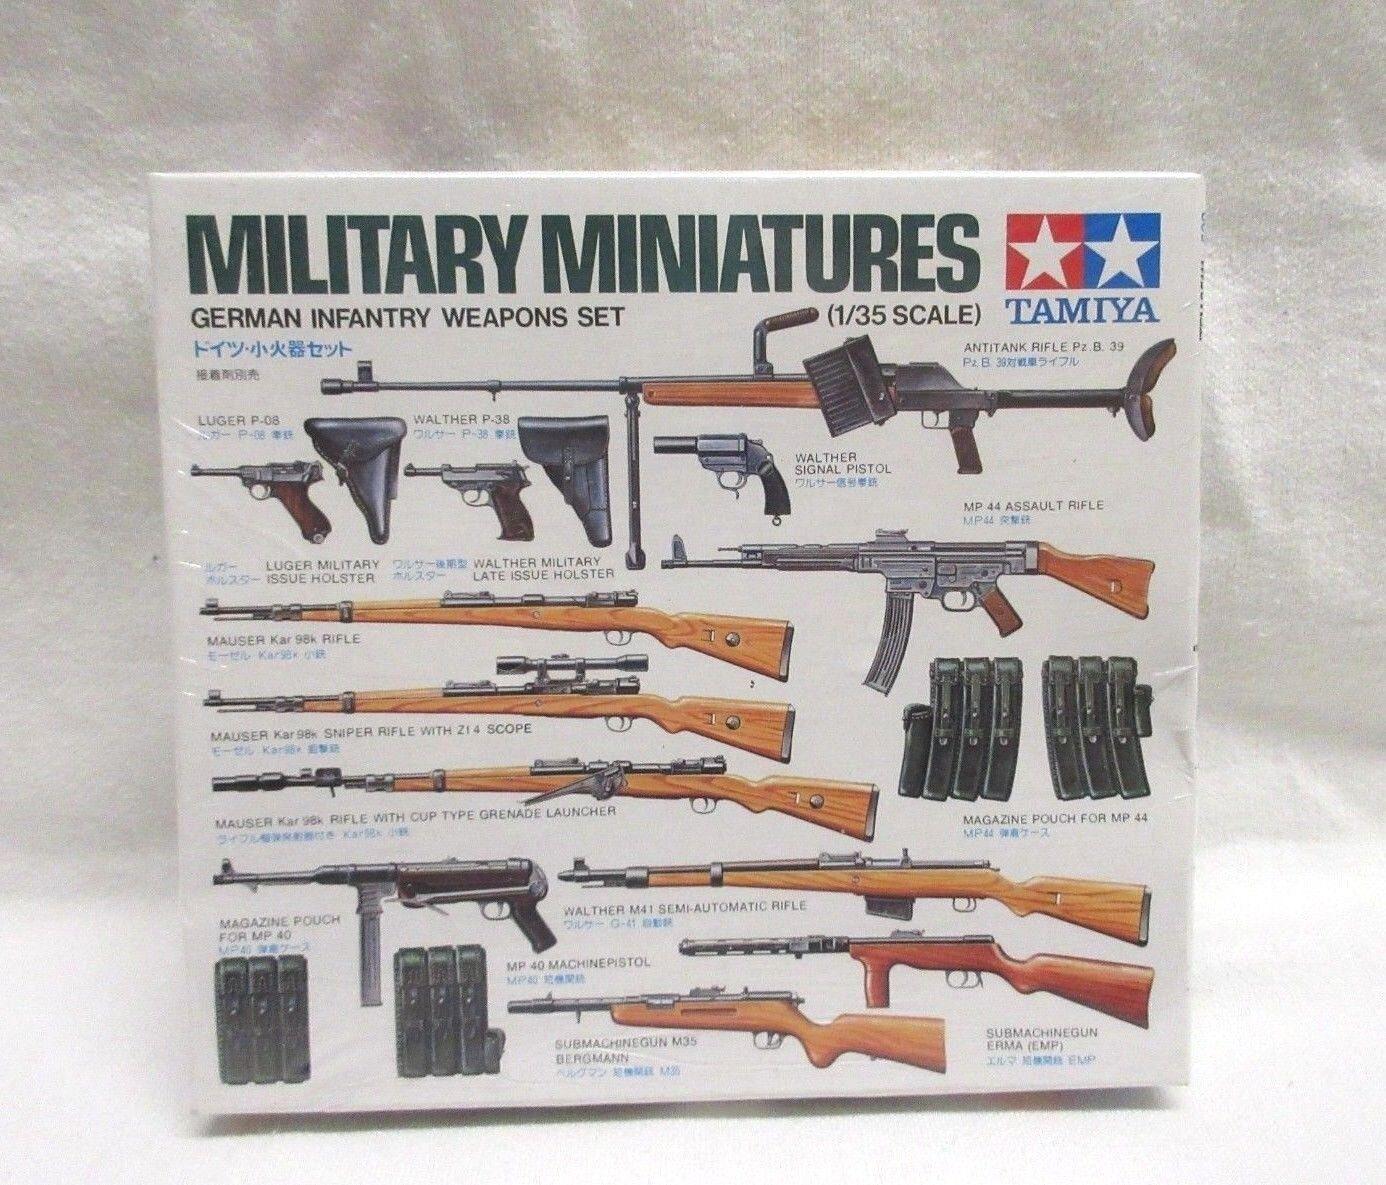 NIP - VTG - Tamiya Military Miniatures 1 35 German Infantry Weapons Set 35111 - $6.99